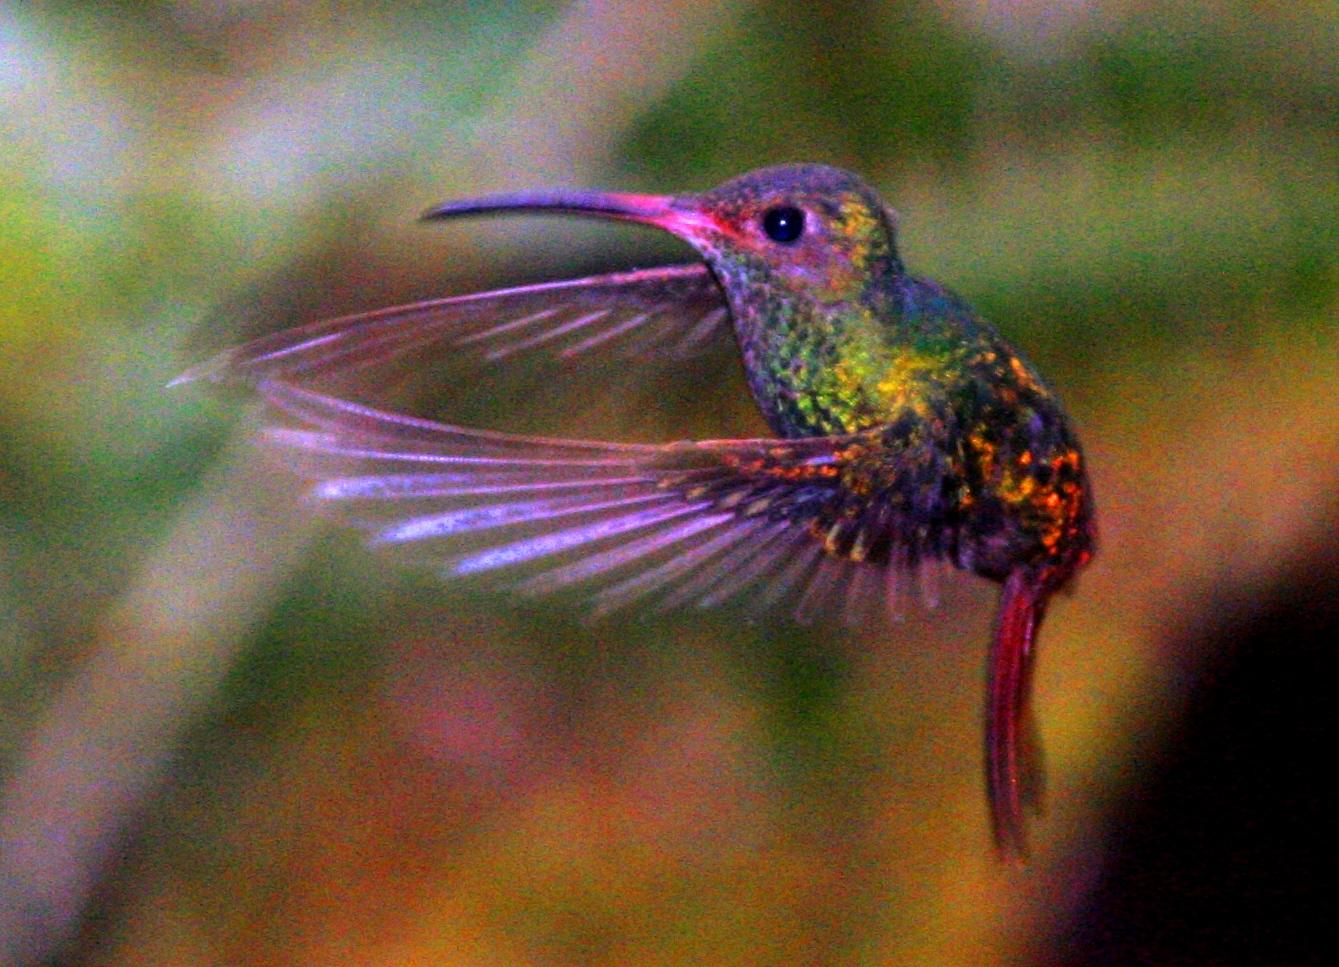 kolibri in ecuador foto bild tiere natur bilder auf fotocommunity. Black Bedroom Furniture Sets. Home Design Ideas